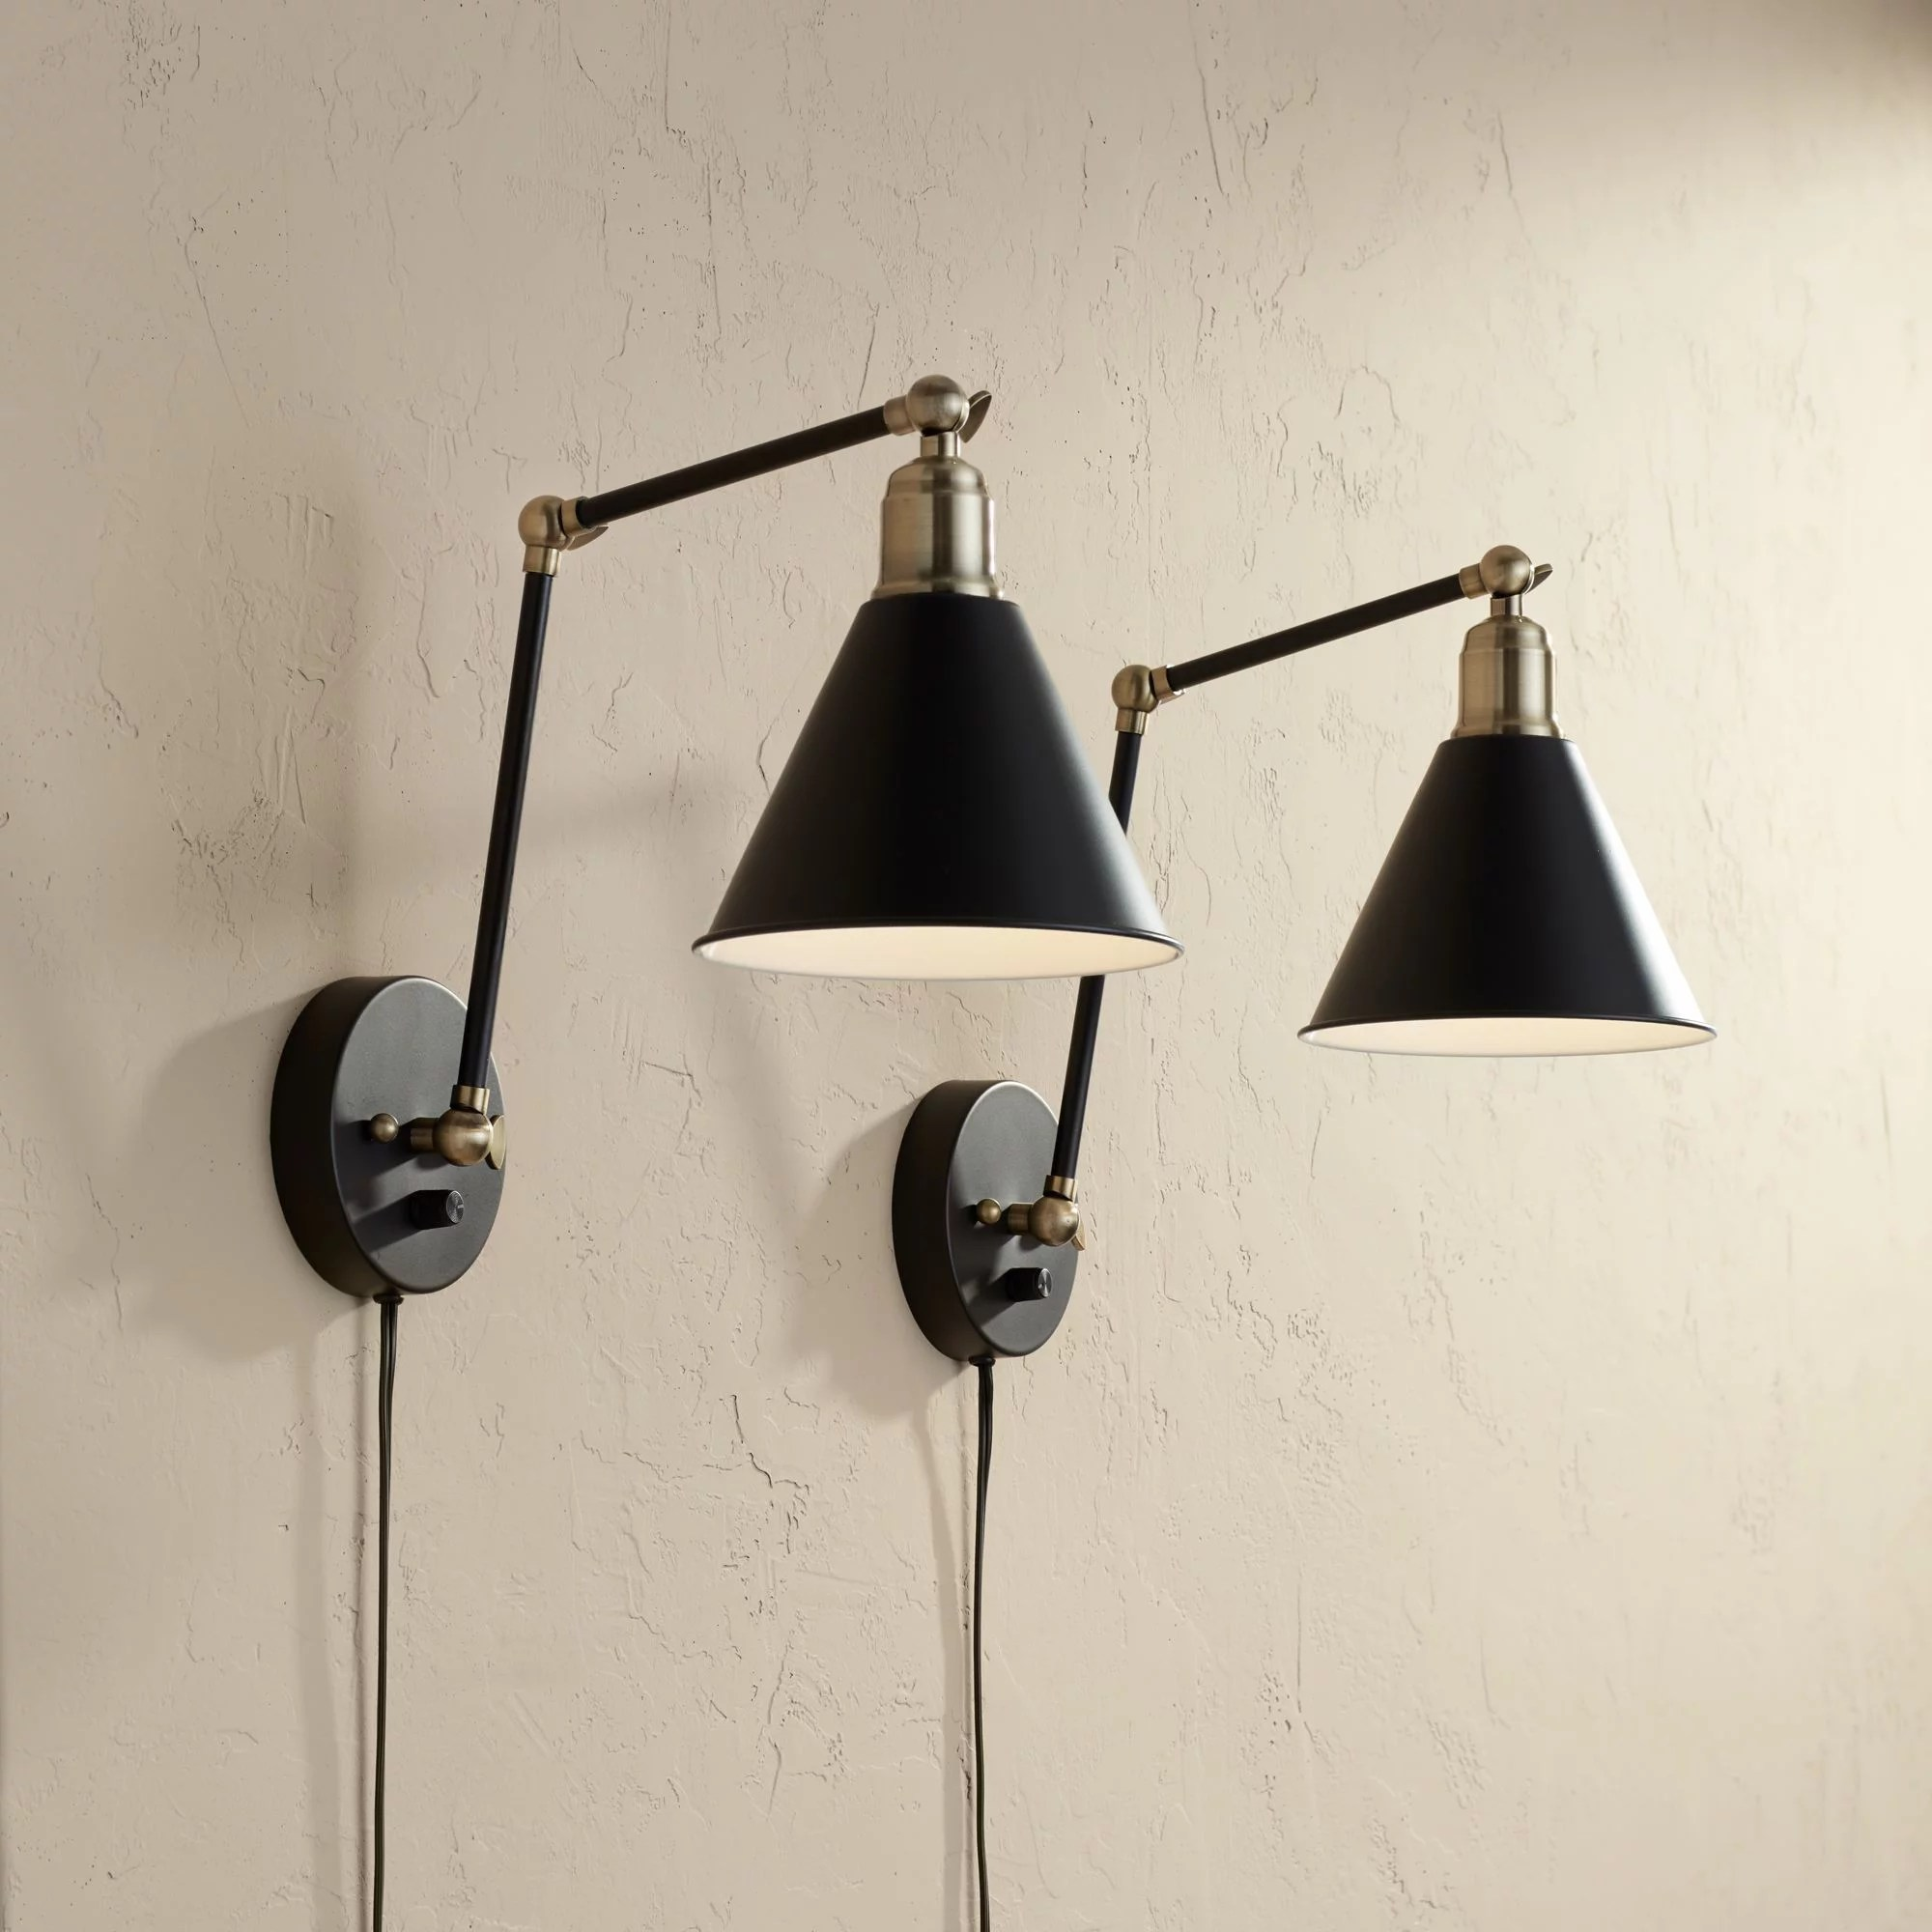 360 Lighting Modern Wall Lamp Plug In Set Of 2 Black And Antique Brass For Bedroom Reading Living Room Walmart Com Walmart Com